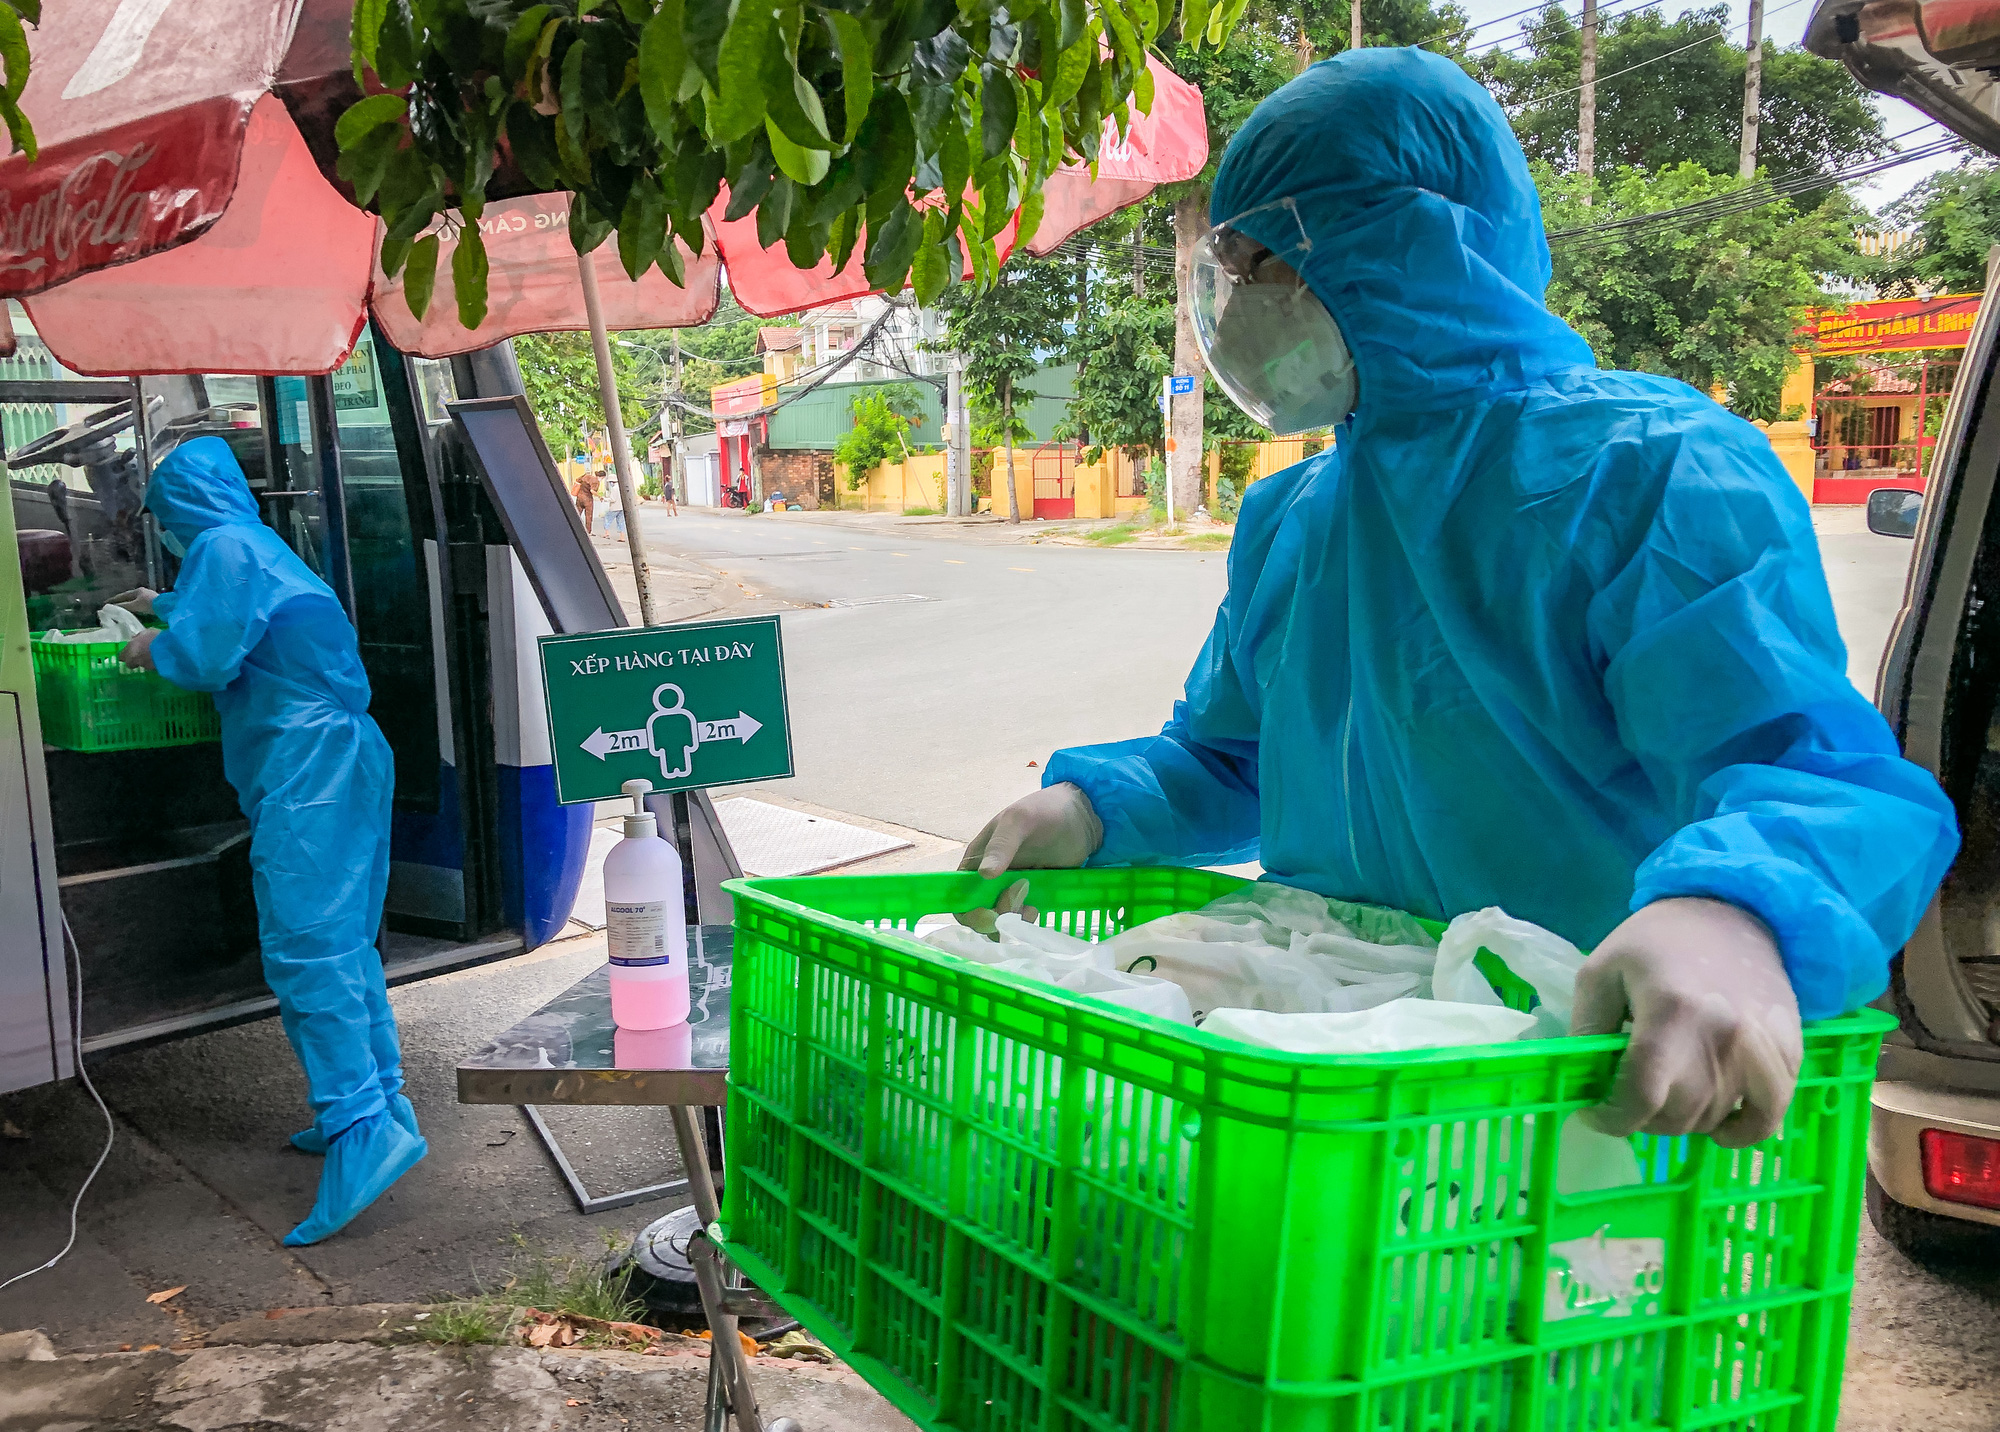 Products are loaded onto the mobile mini-supermarket. Photo: Kim Ut / Tuoi Tre